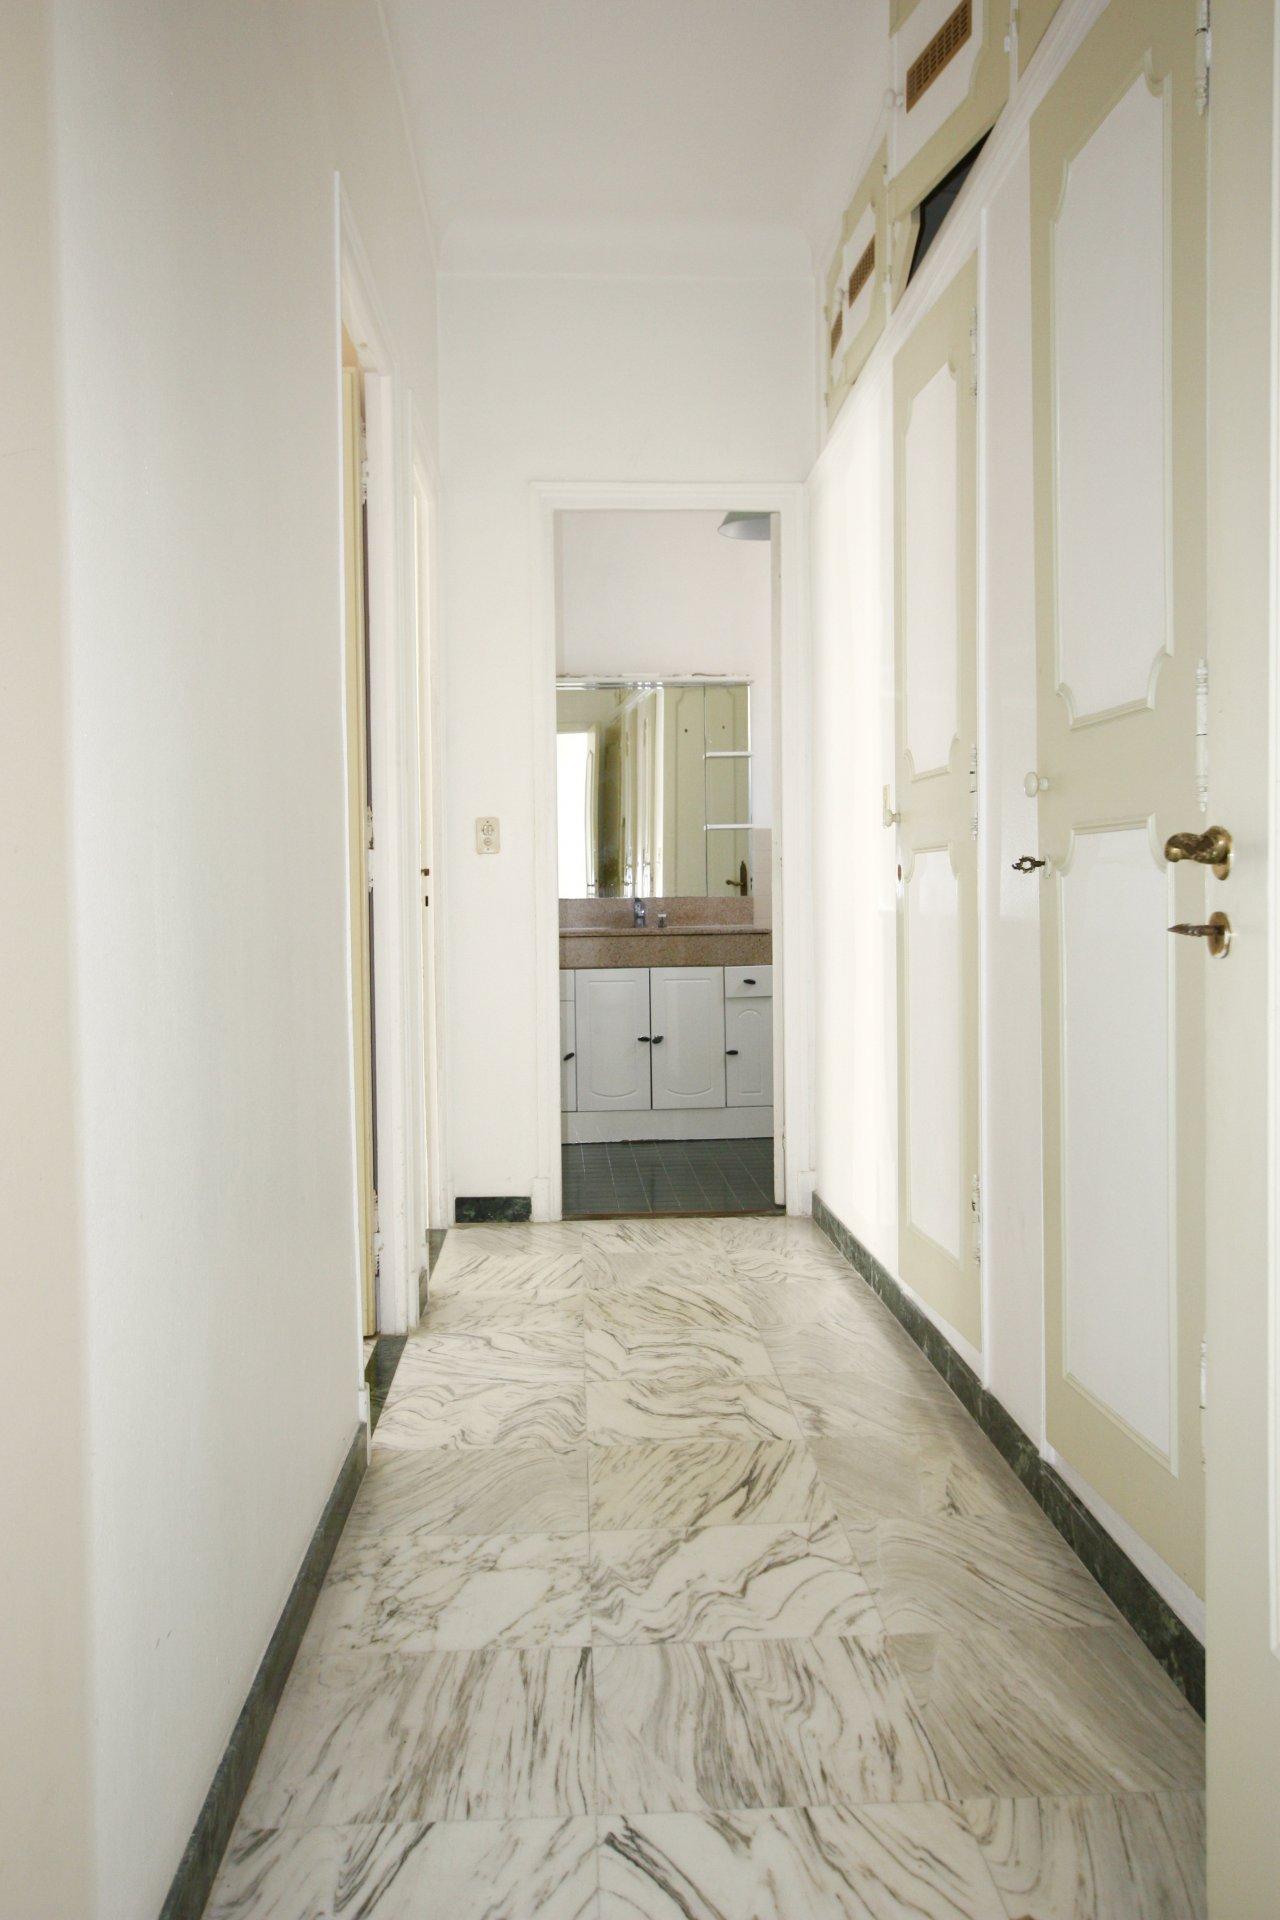 2 Bedrooms apartment Victor Hugo